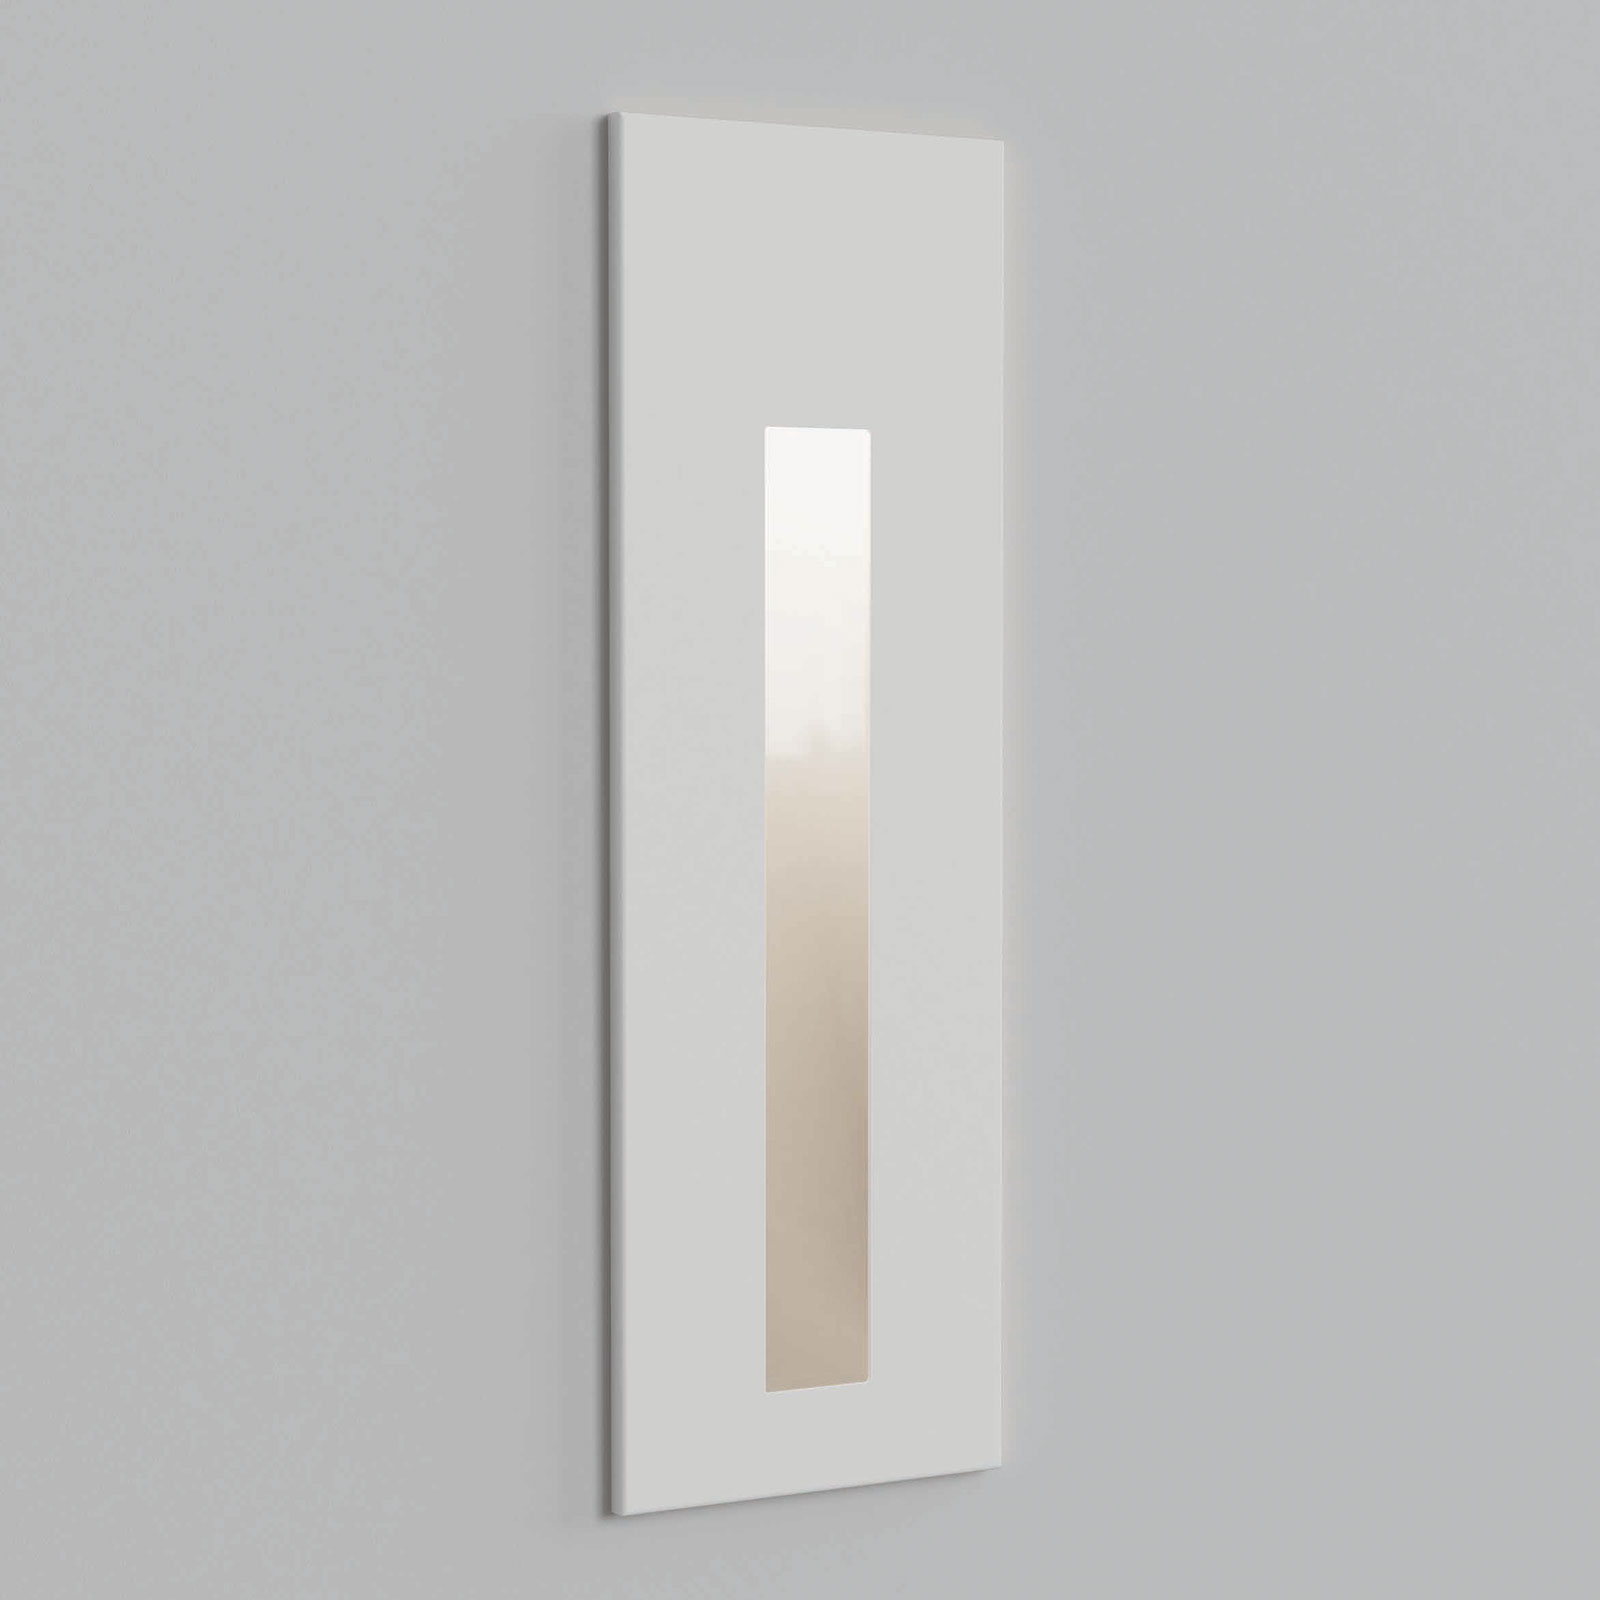 Astro Borgo 55 applique encastr. blanche texturée